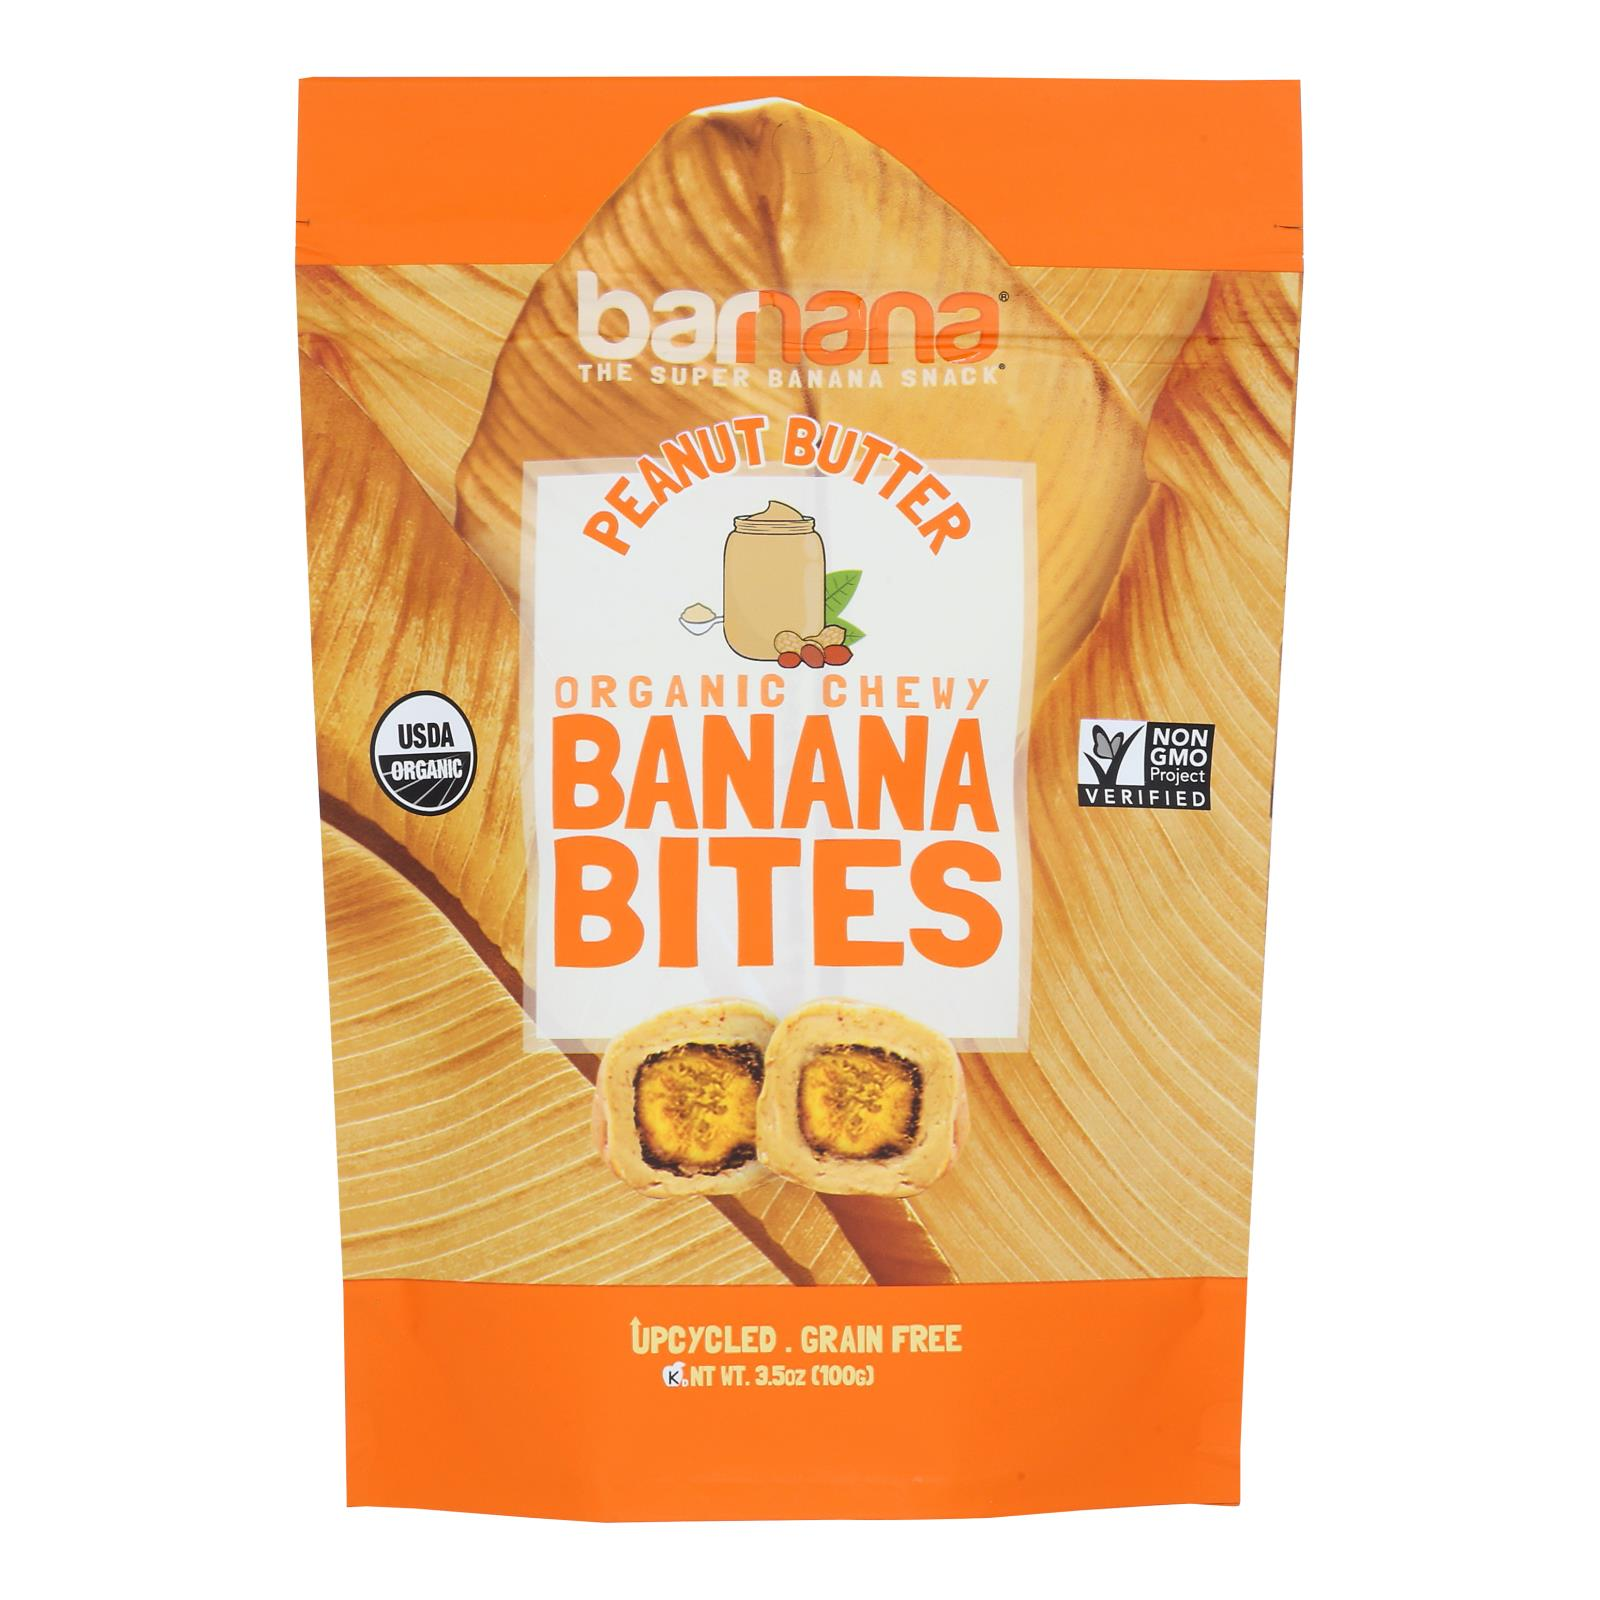 Barnana Chewy Banana Bites - Organic Peanut Butter - Case of 12 - 3.5 oz.